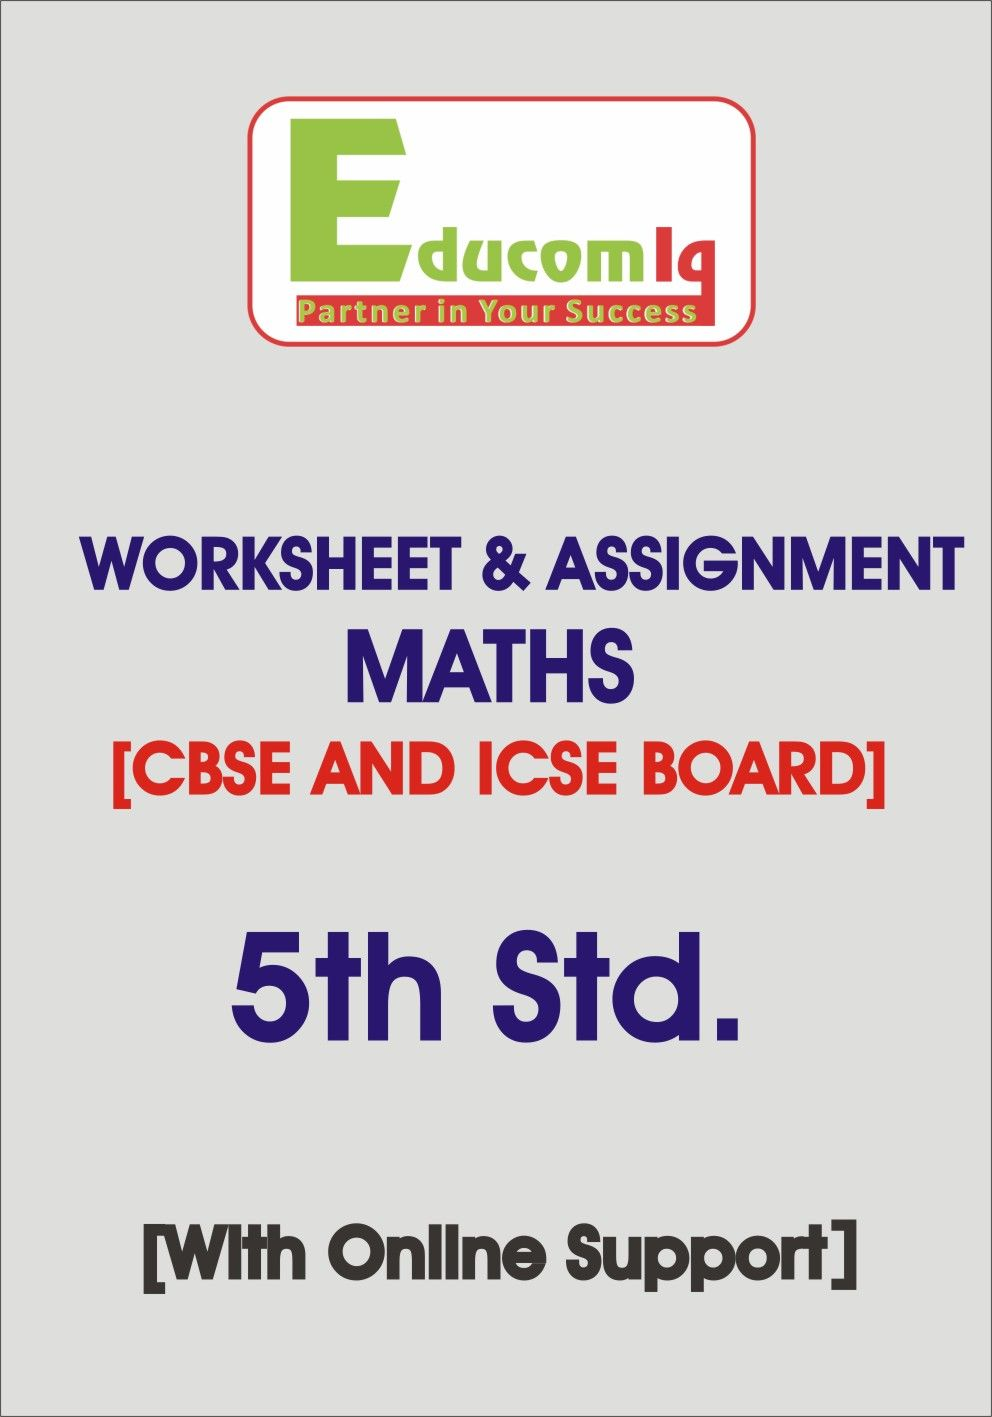 Worksheet Maths 5th Std Cbse Board Math Work Math Maths Syllabus [ 1417 x 992 Pixel ]